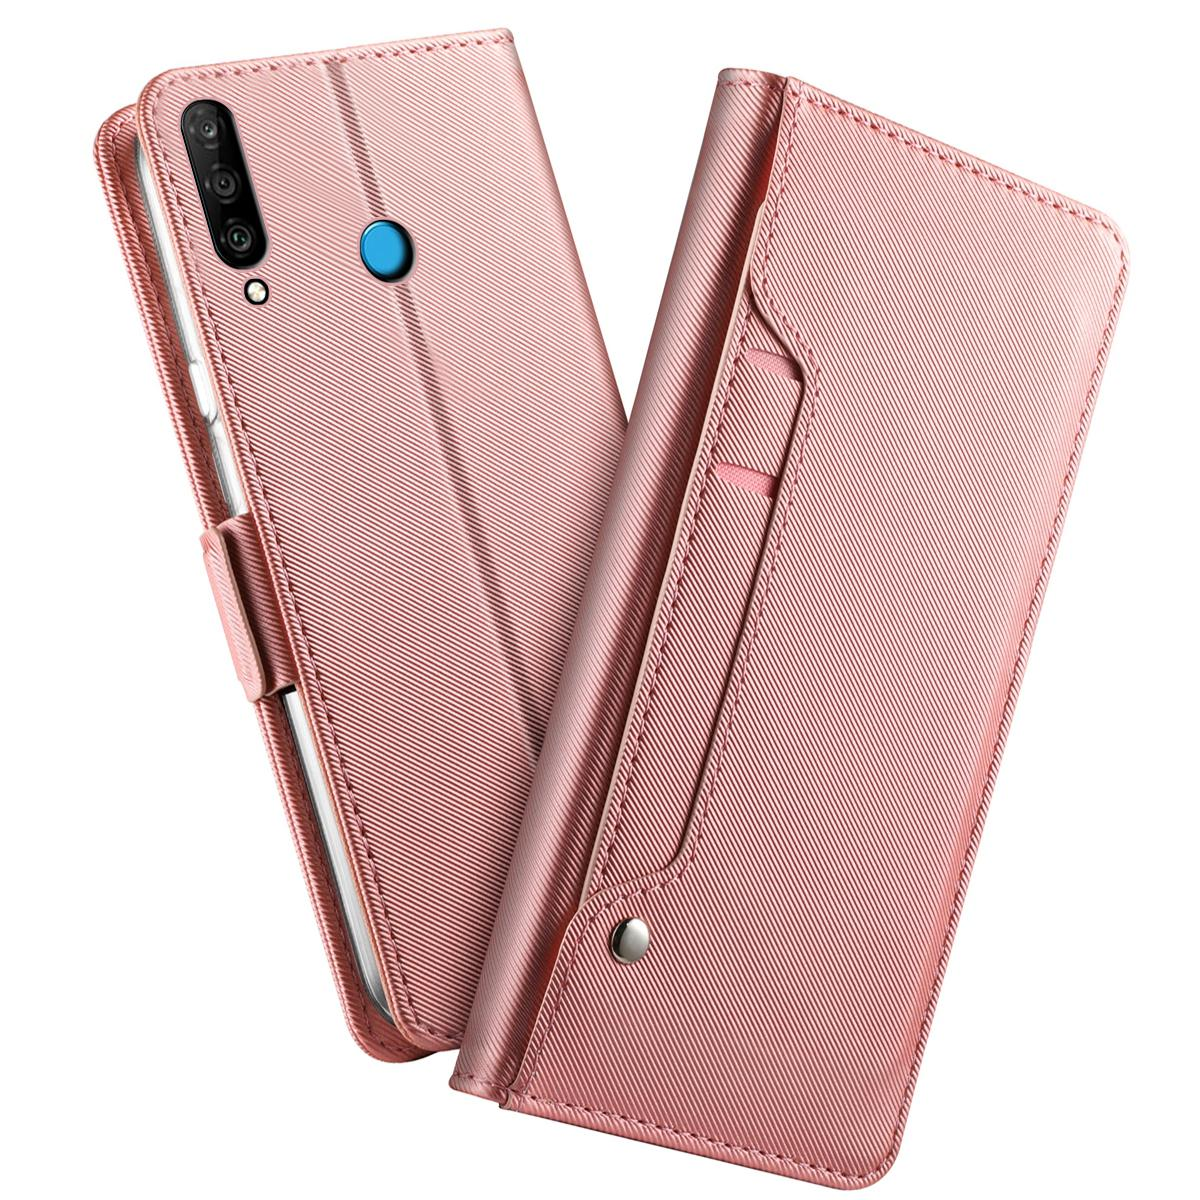 Plånboksfodral Spegel Huawei P30 Lite Rosa Guld